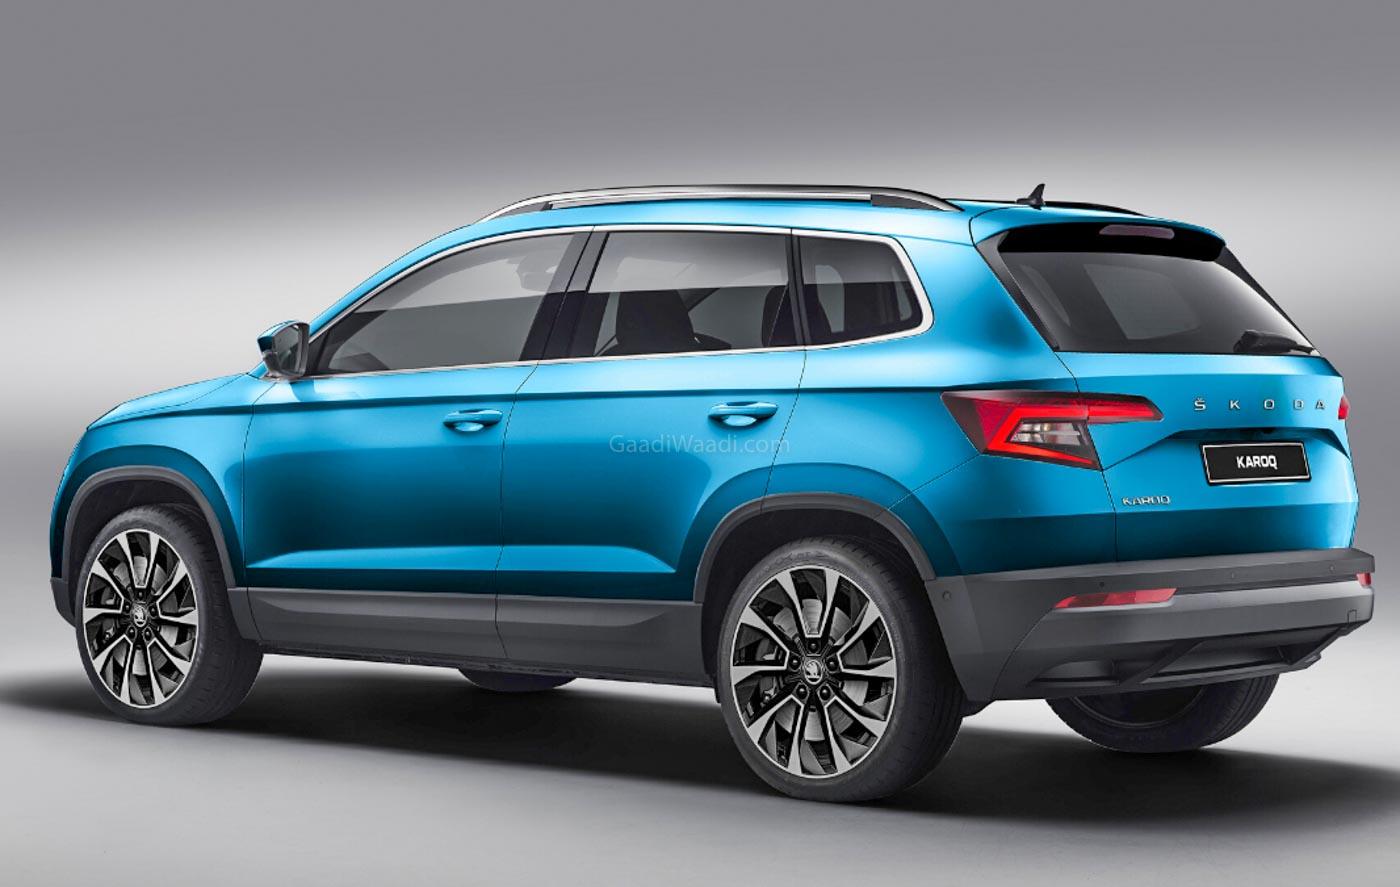 Skoda India Sold 151 Units Of New Karoq SUV In June 2020